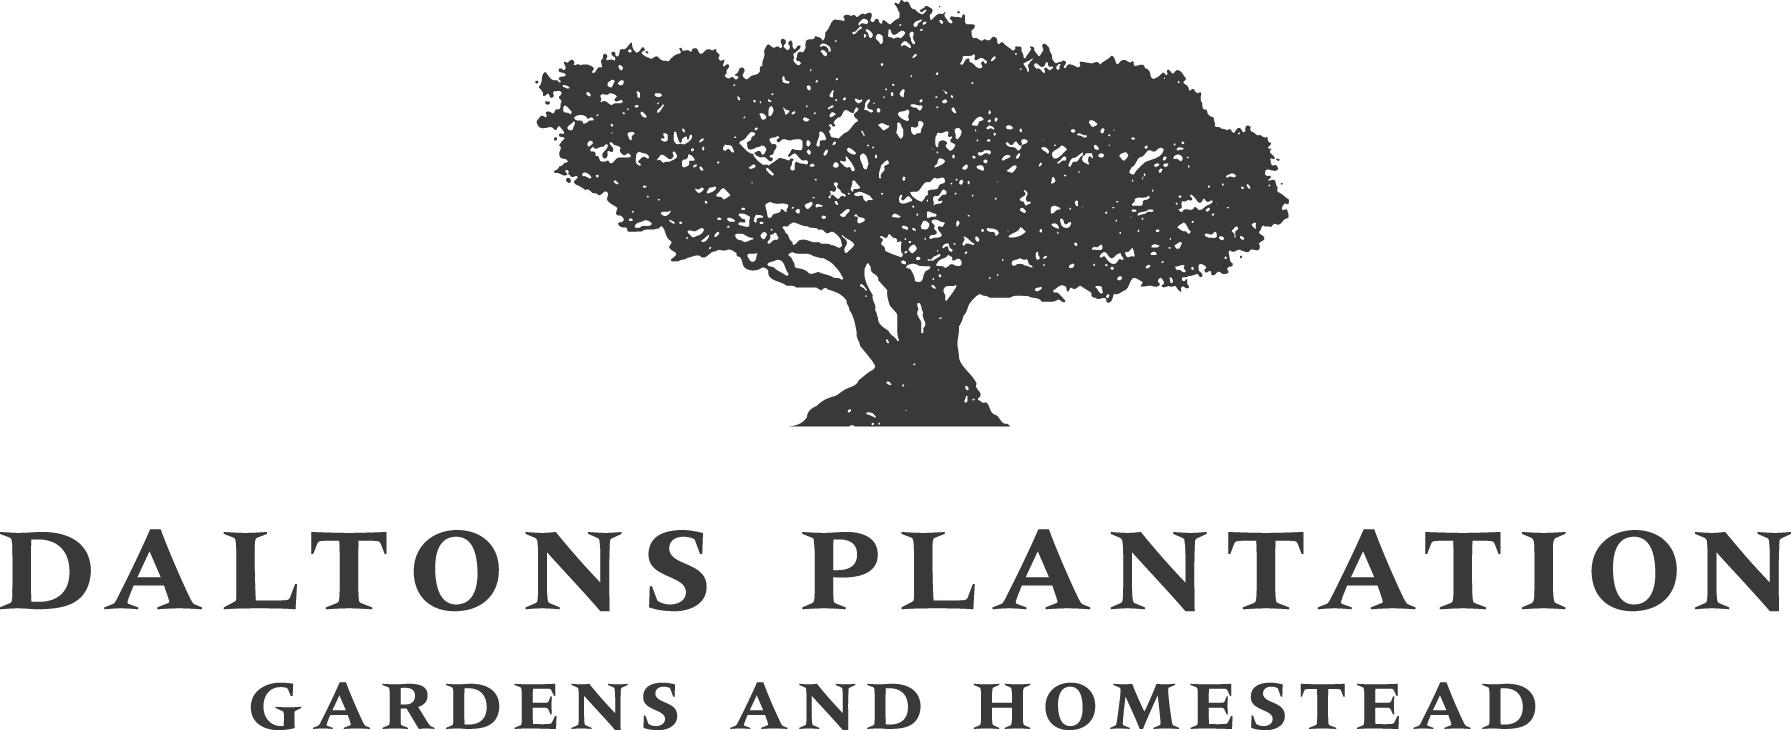 Daltons Plantation logo